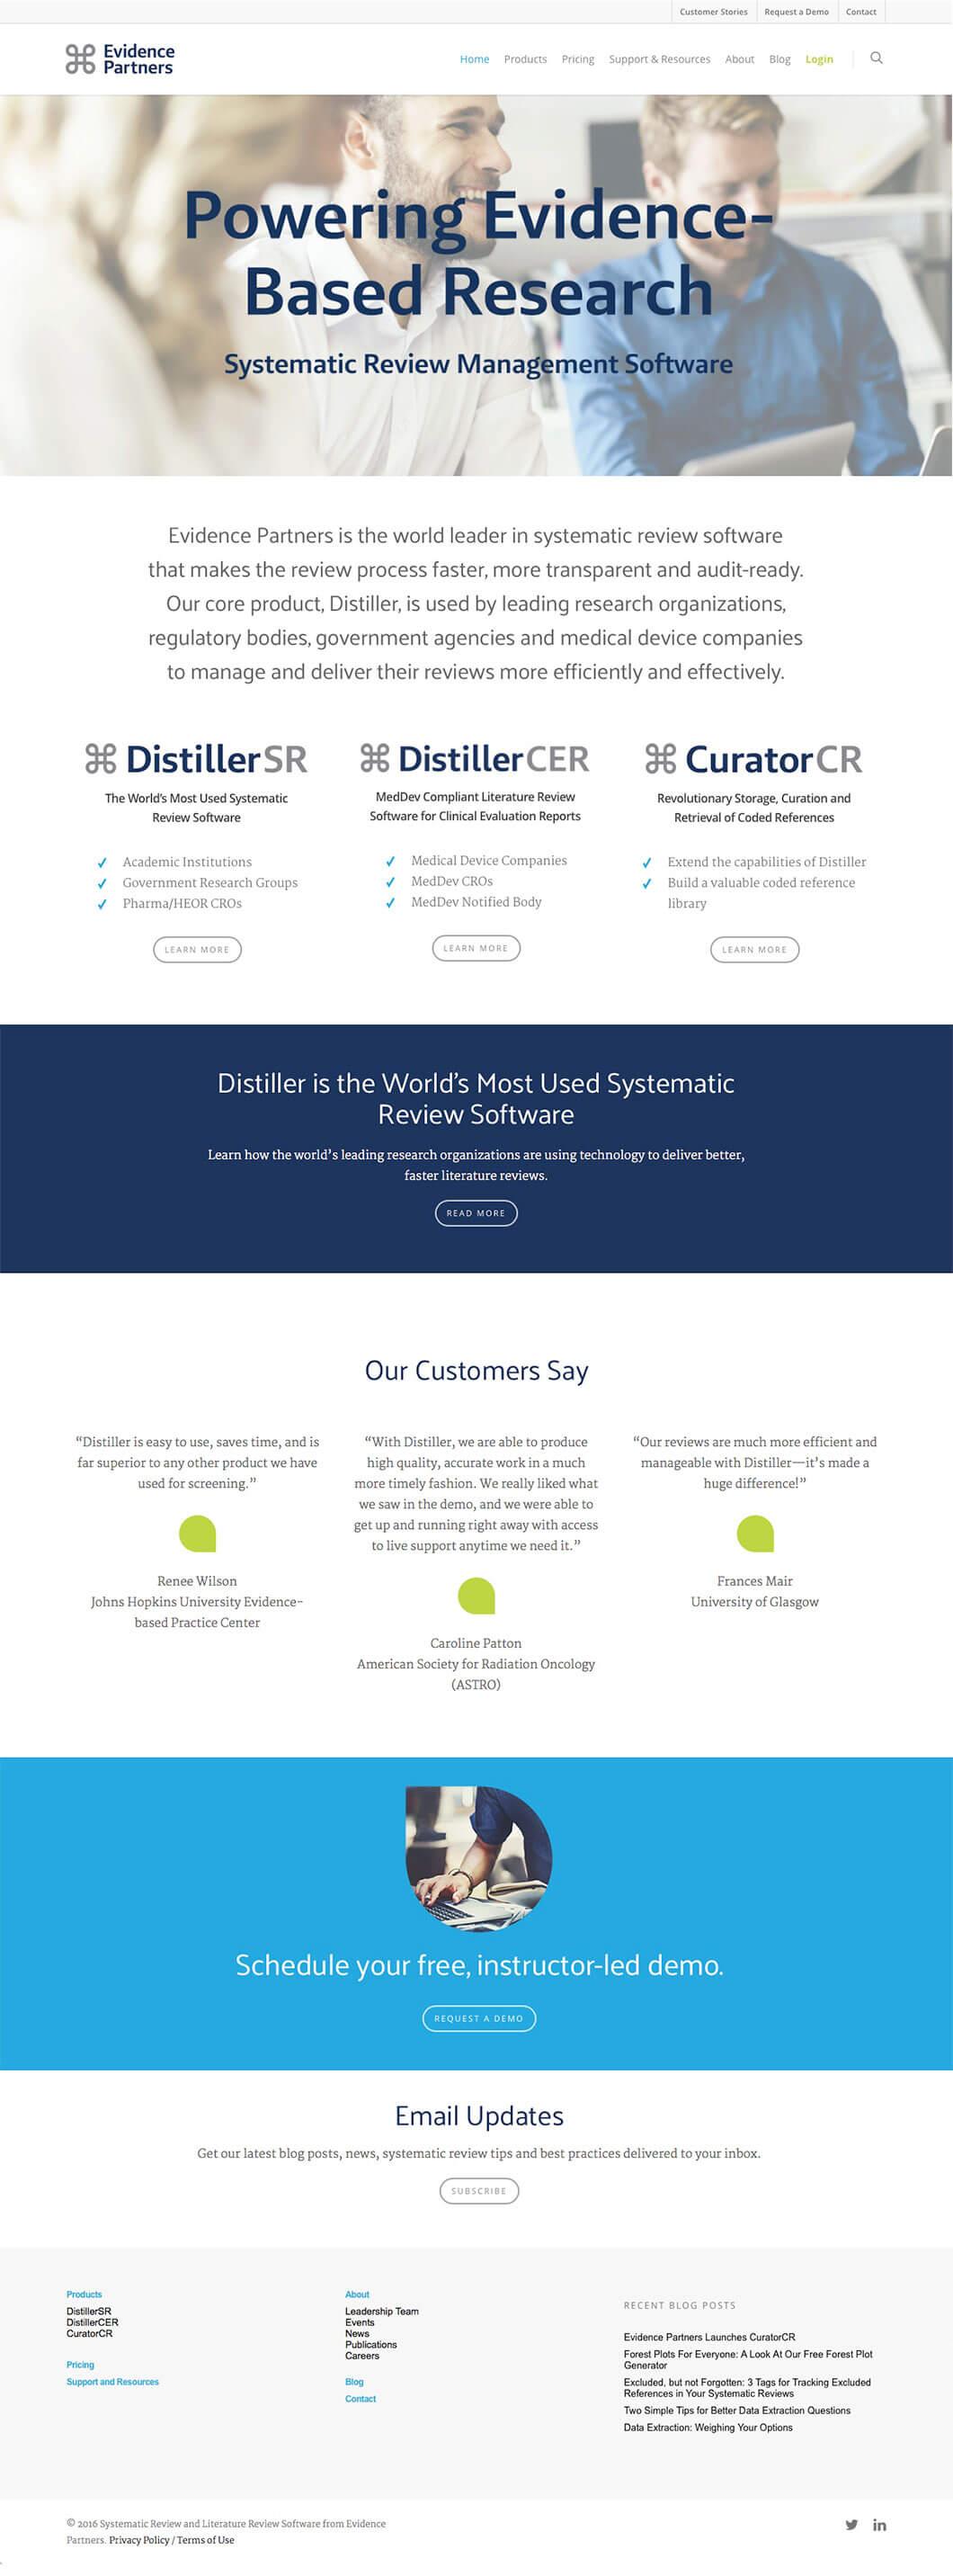 Evidence Partners Website by Ottawa Graphic Designer idApostle